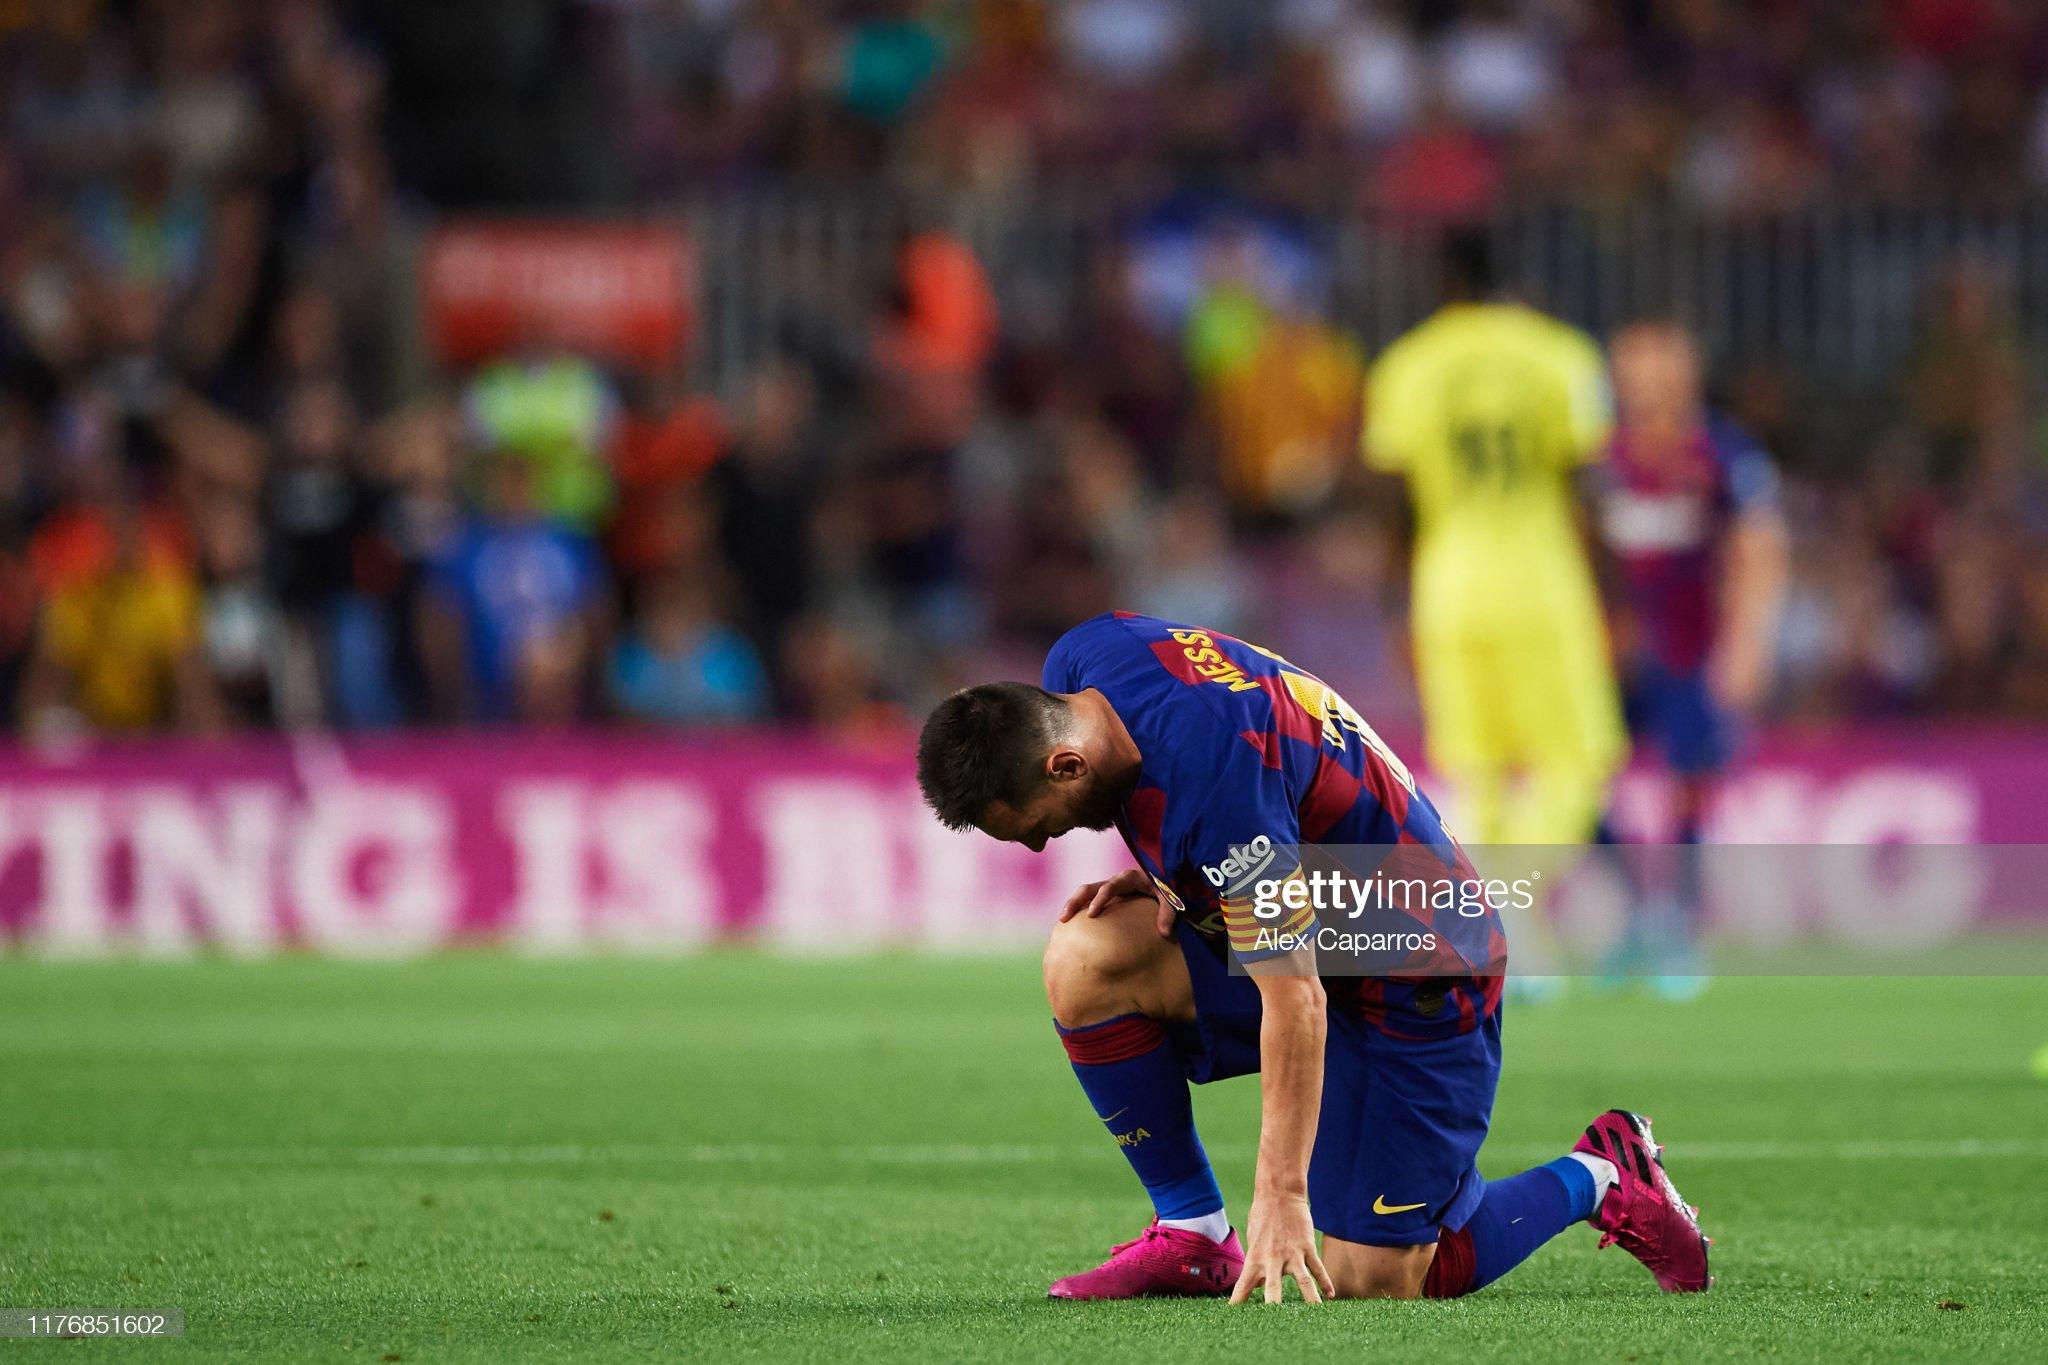 صور مباراة : برشلونة - فياريال 2-1 ( 24-09-2019 )  Lionel-messi-of-fc-barcelona-lays-on-the-pitch-during-the-liga-match-picture-id1176851602?s=2048x2048